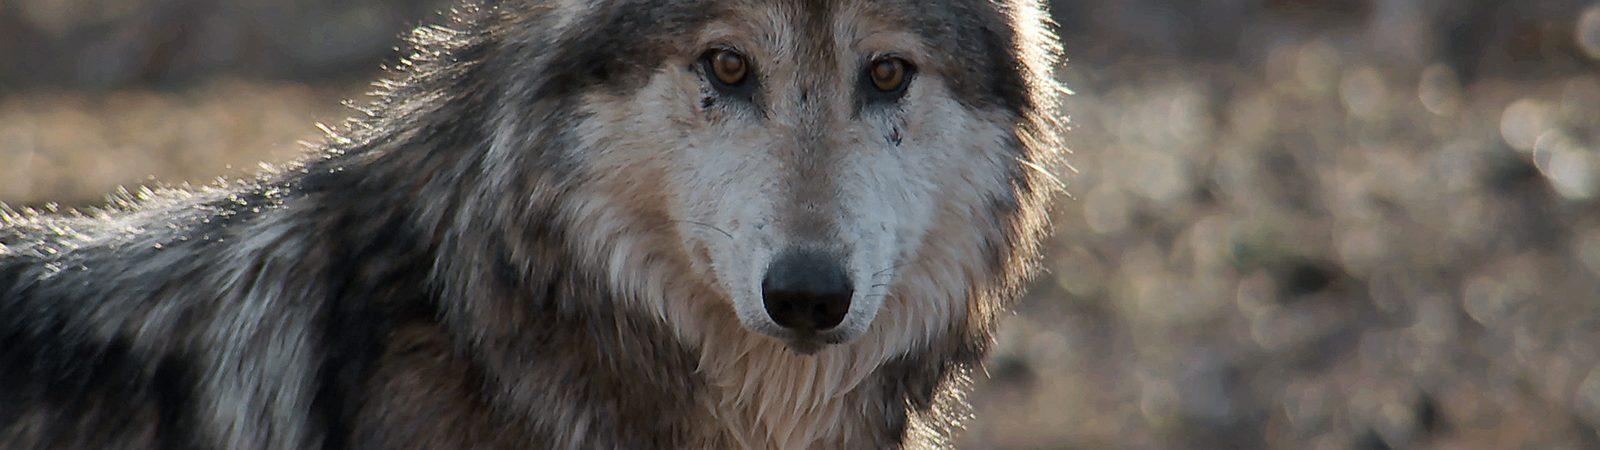 Mexican gray wolf movie still